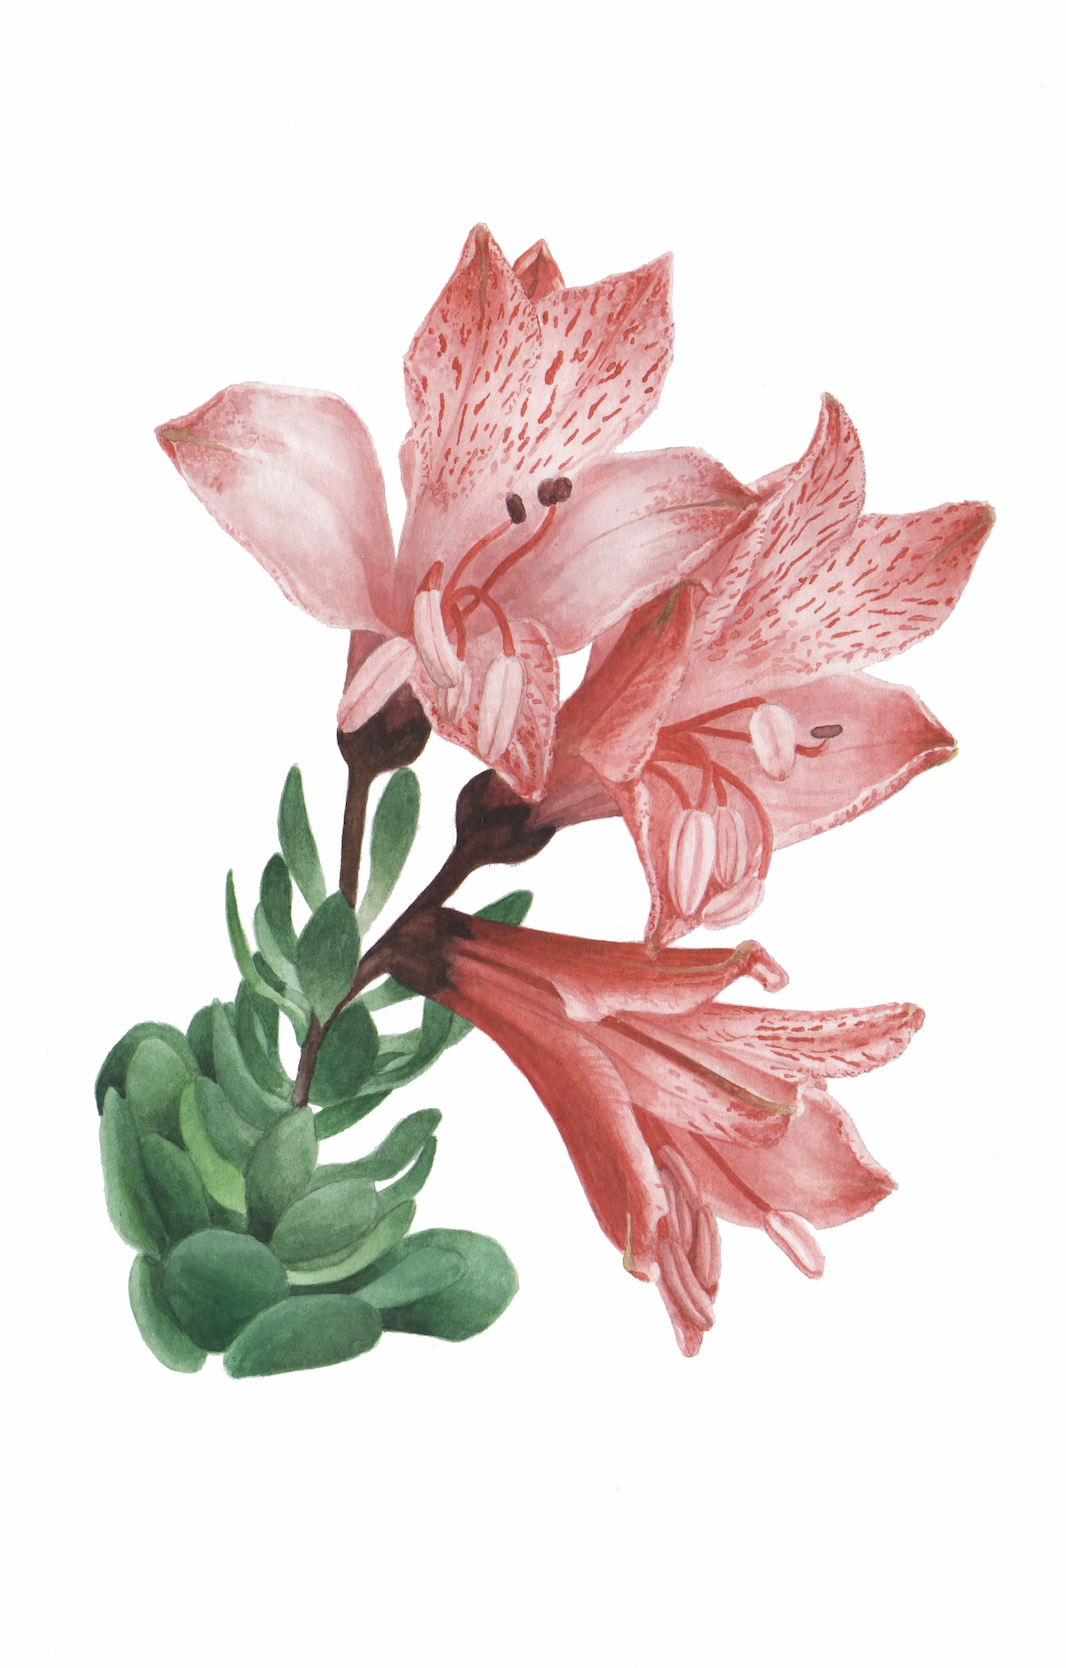 lstroemeria spathulata